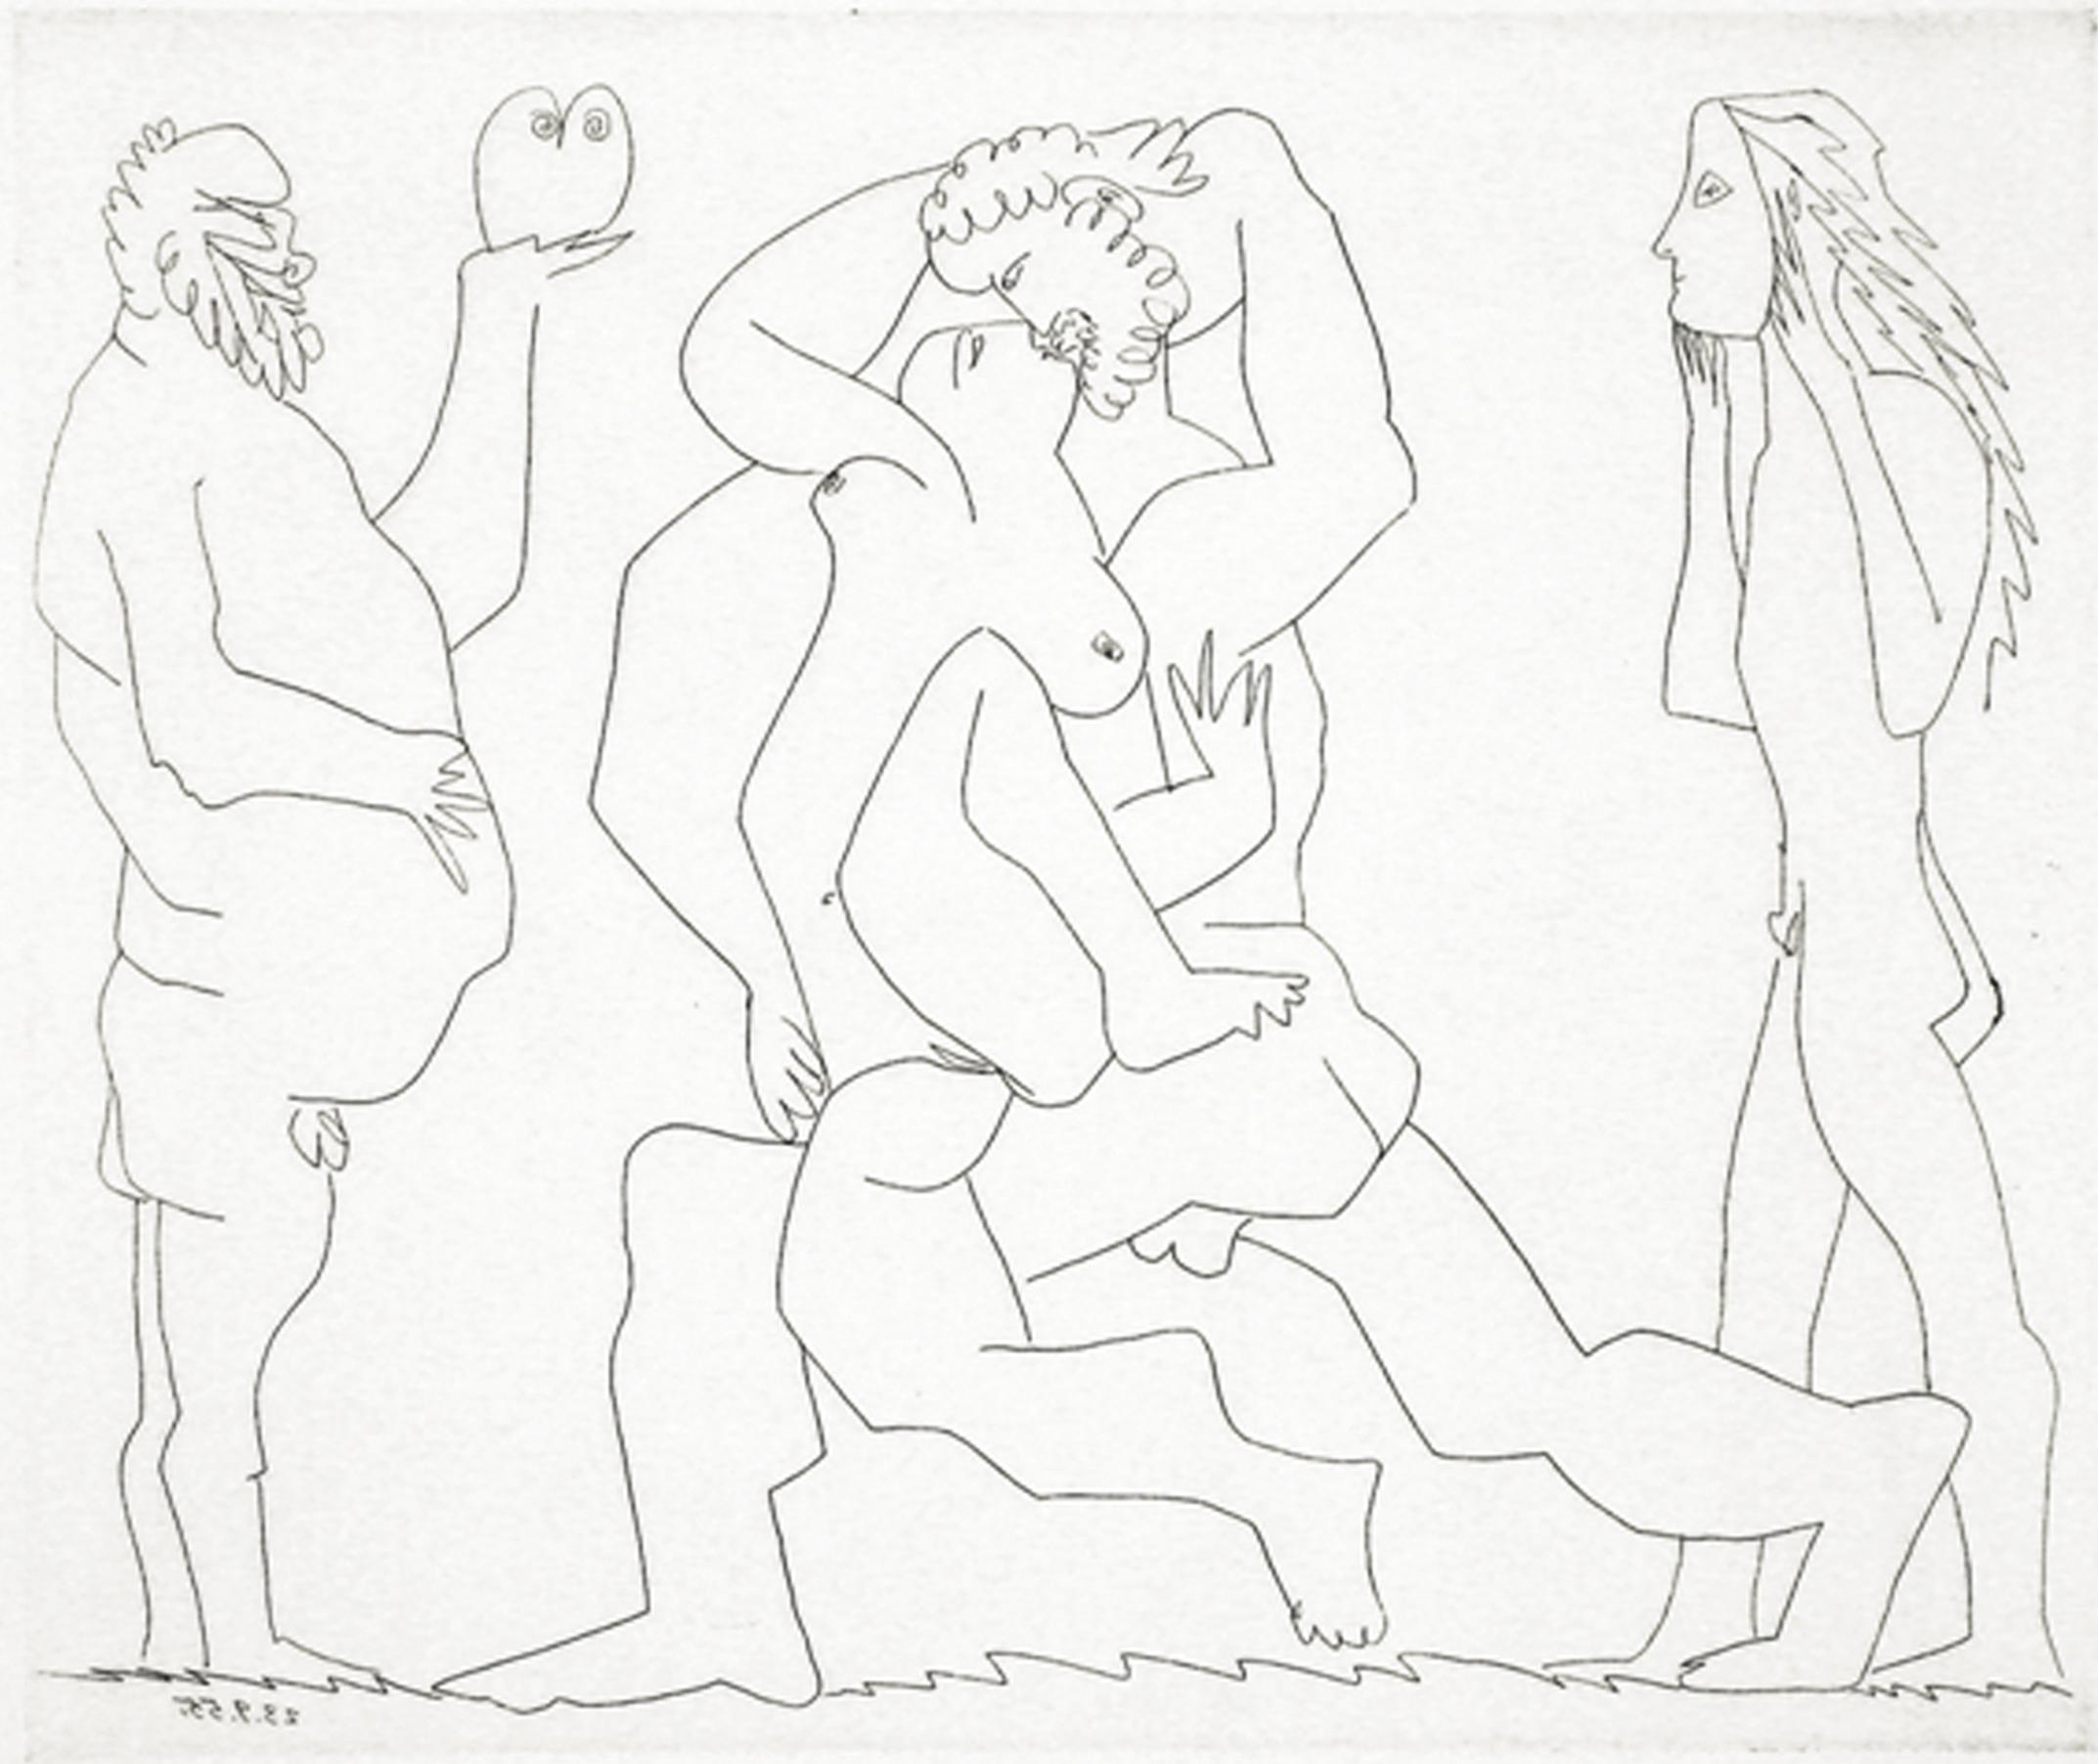 2145x1804 Late Work, 1954 1972